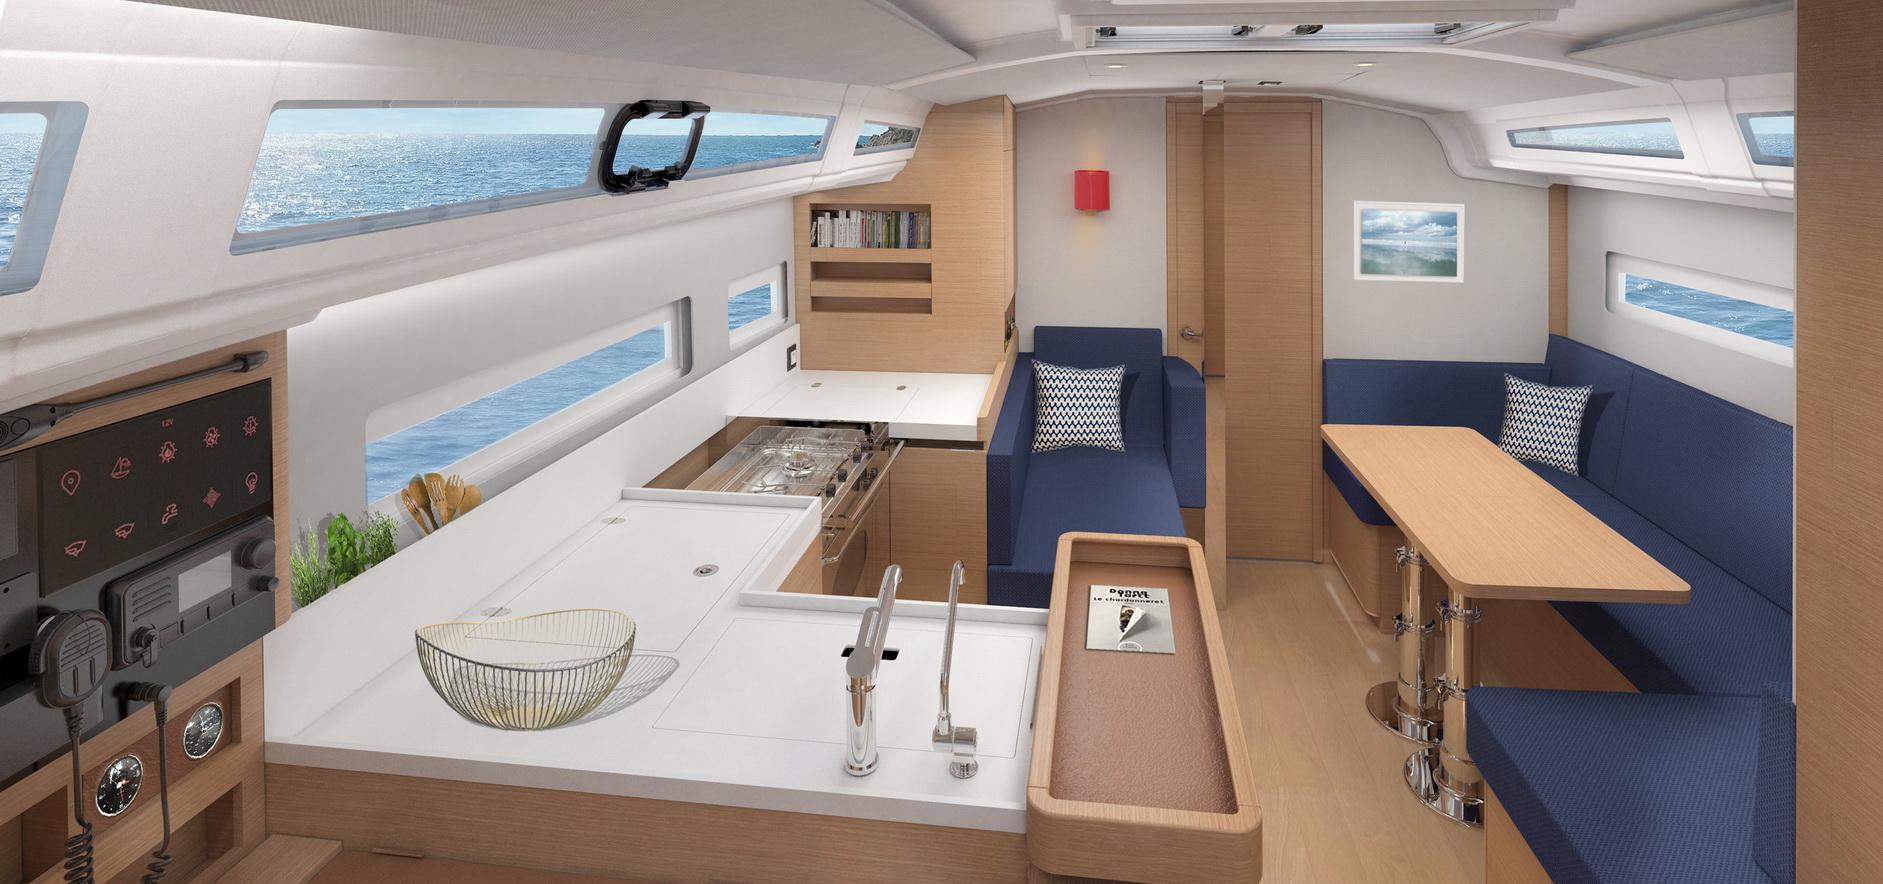 Trend Travel Yachting Sun Odyssey 410 Innen (17)